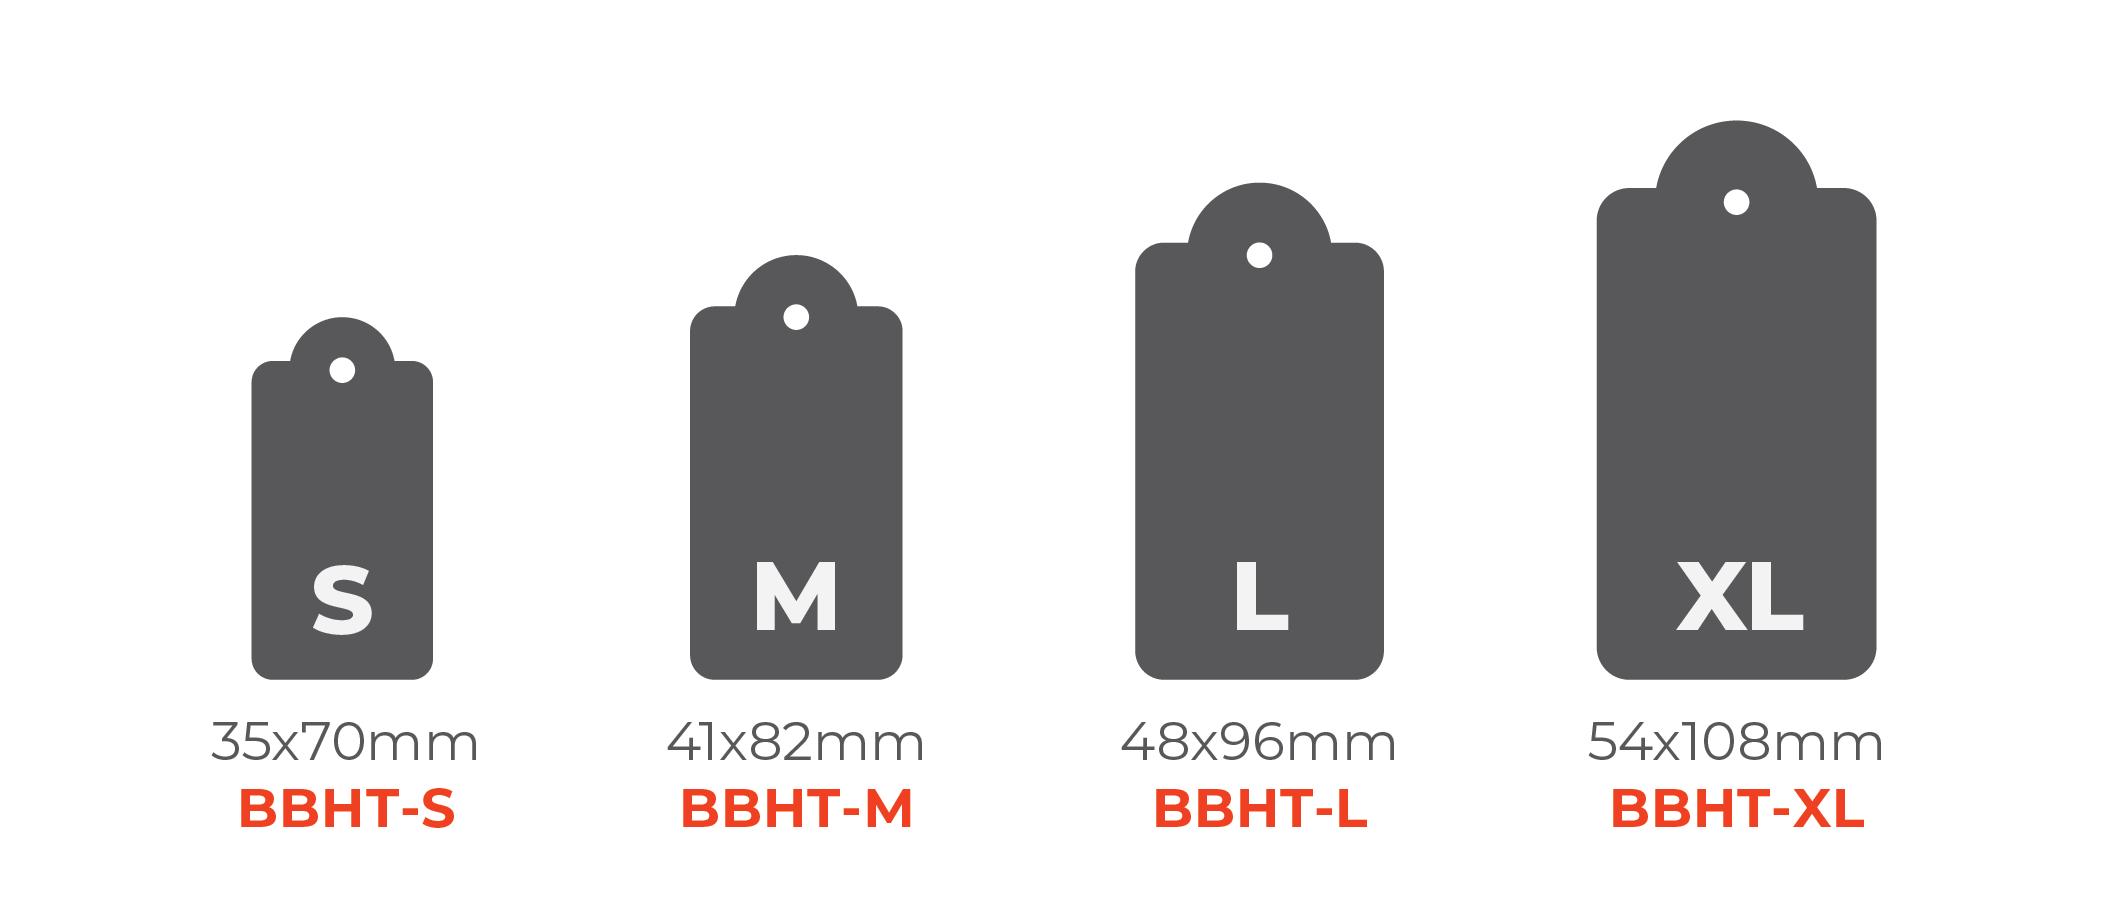 Standard Hang Tags - Bubble Tags 0x0mm 01 Image